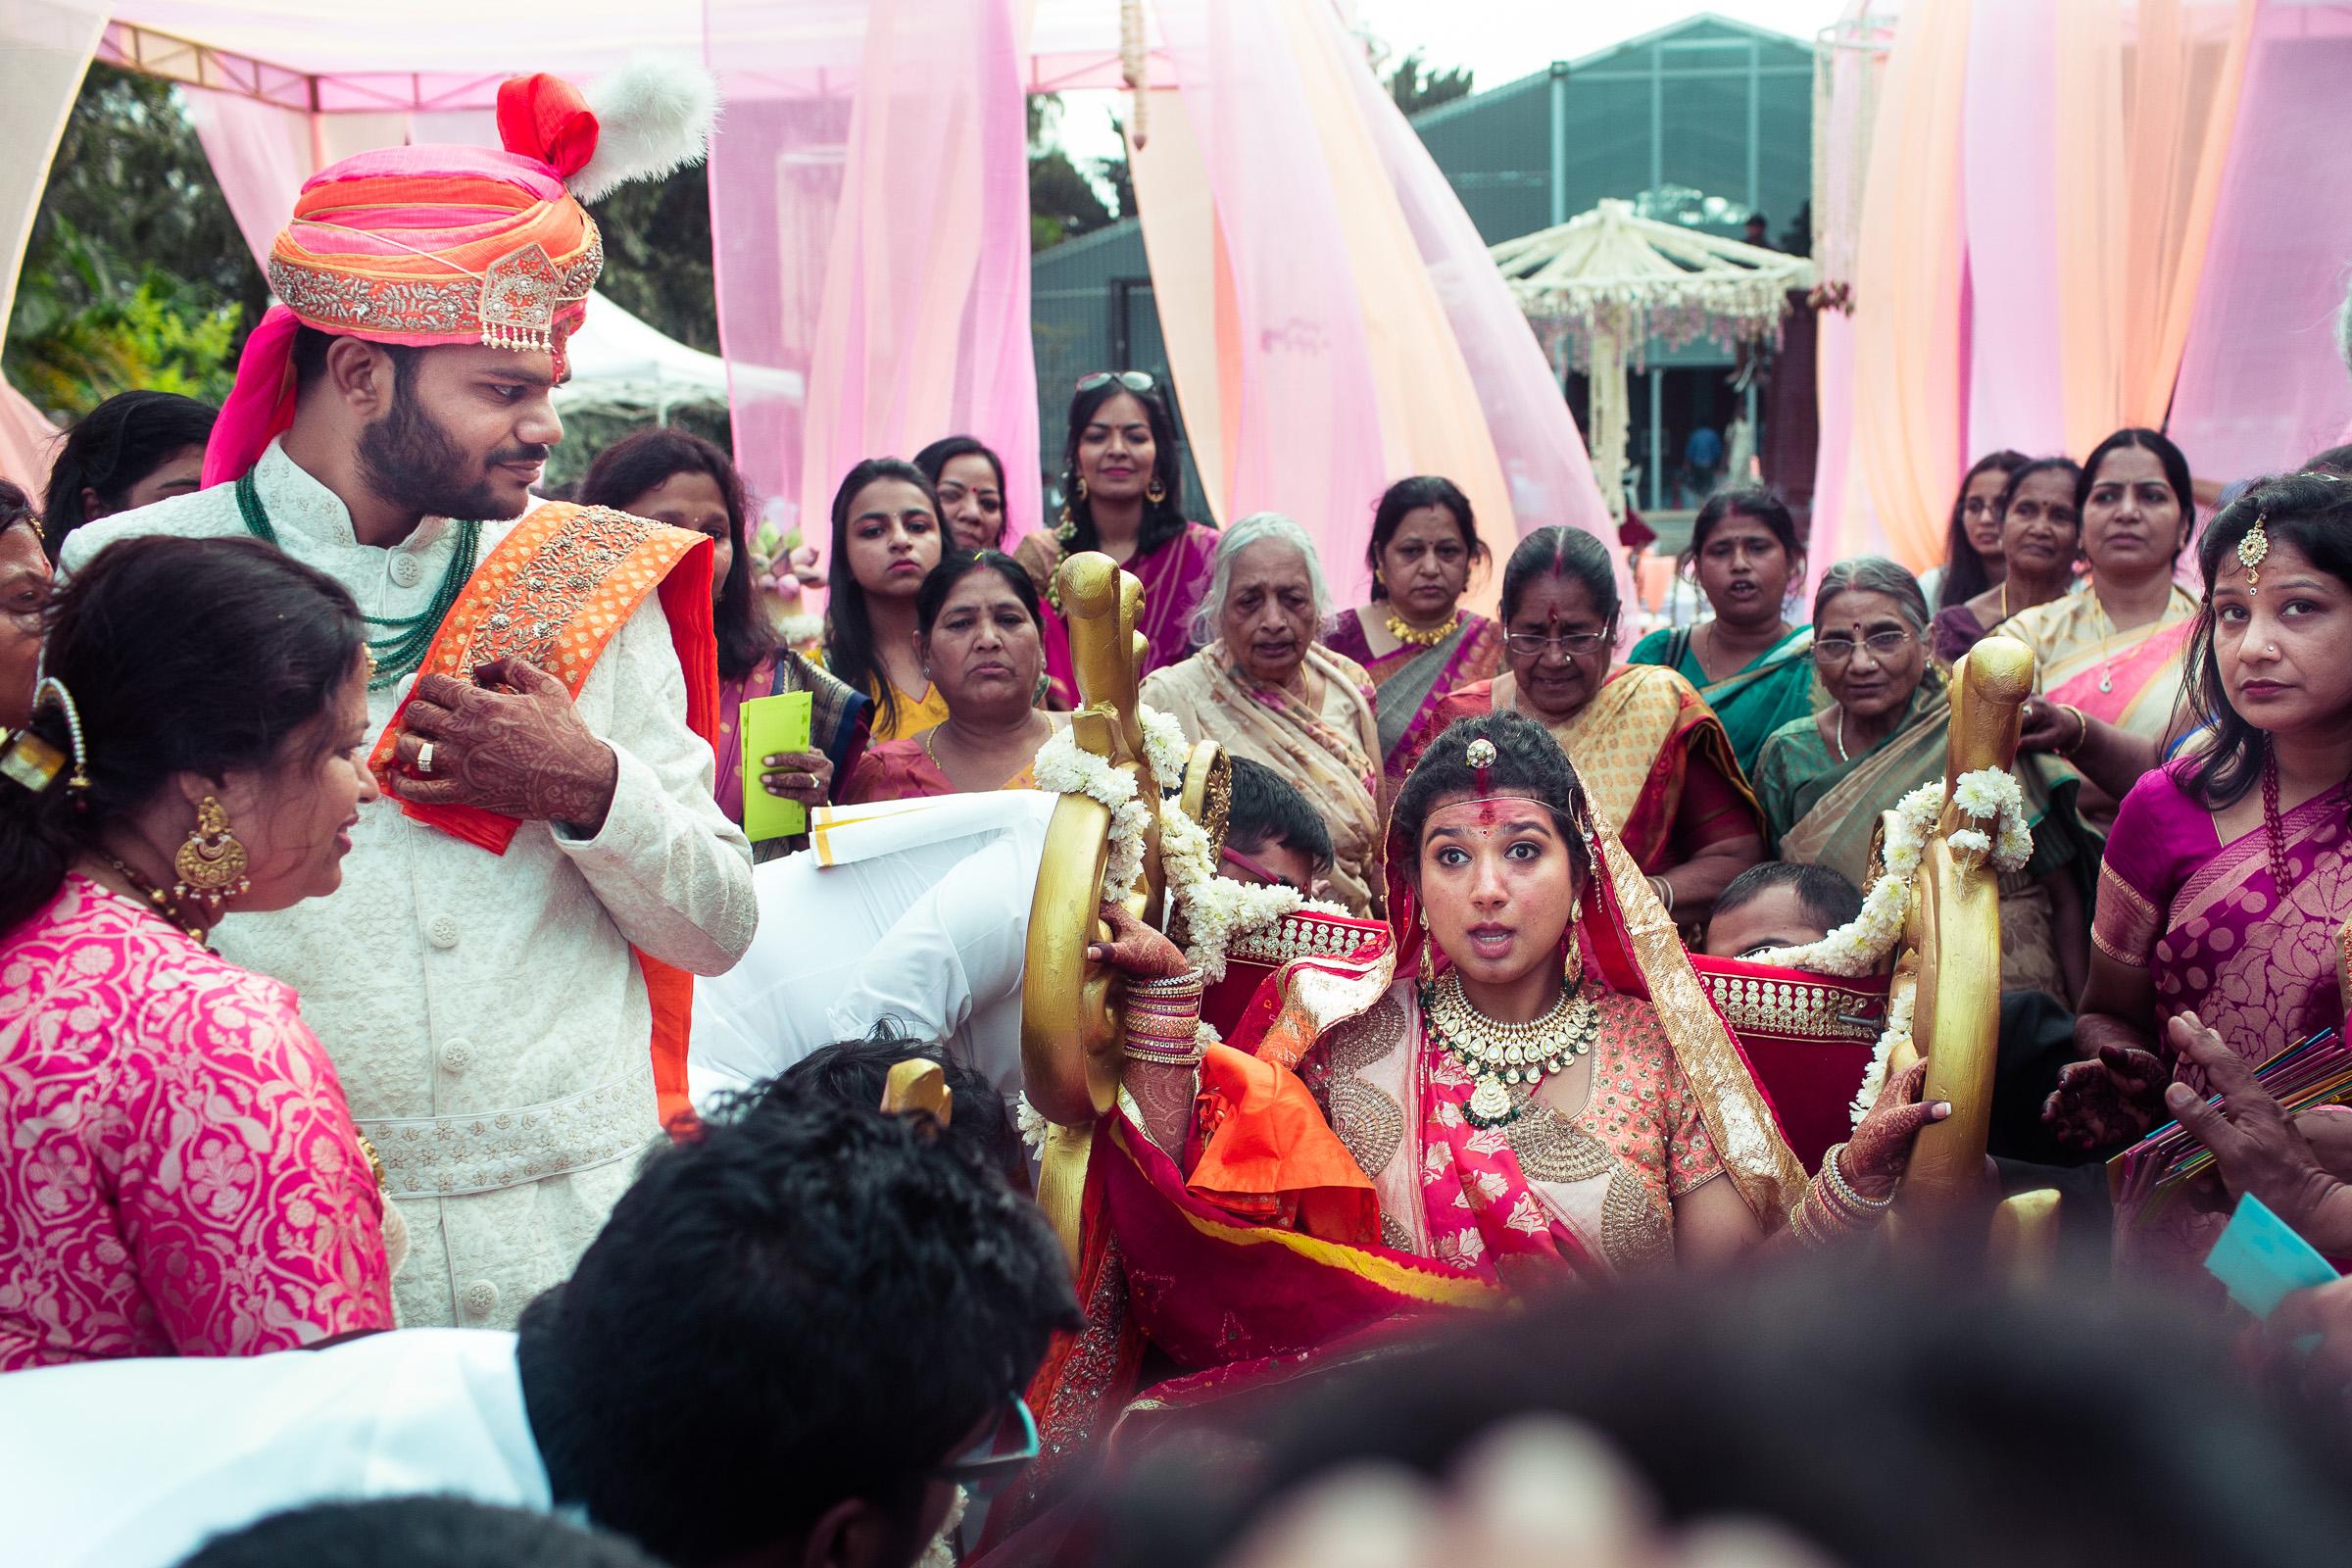 marwari-candid-wedding-photographers-bangalore-0053.jpg